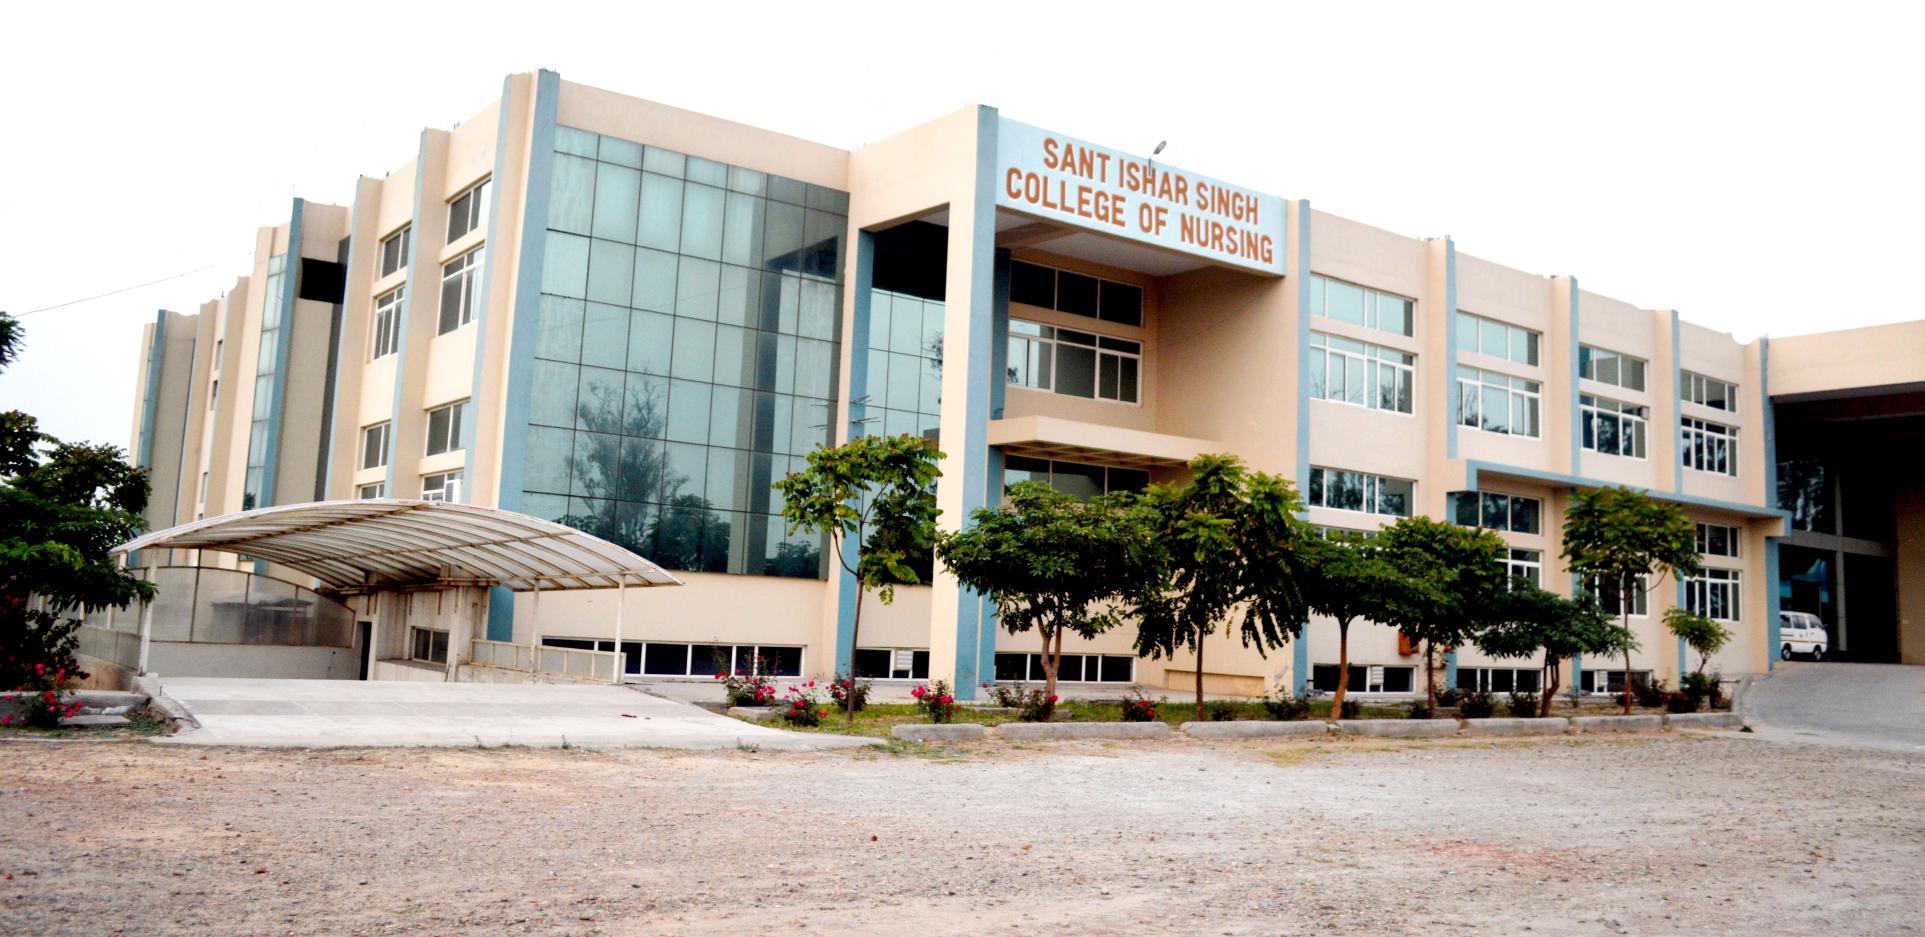 Sant Ishar Singh College of Nursing Image